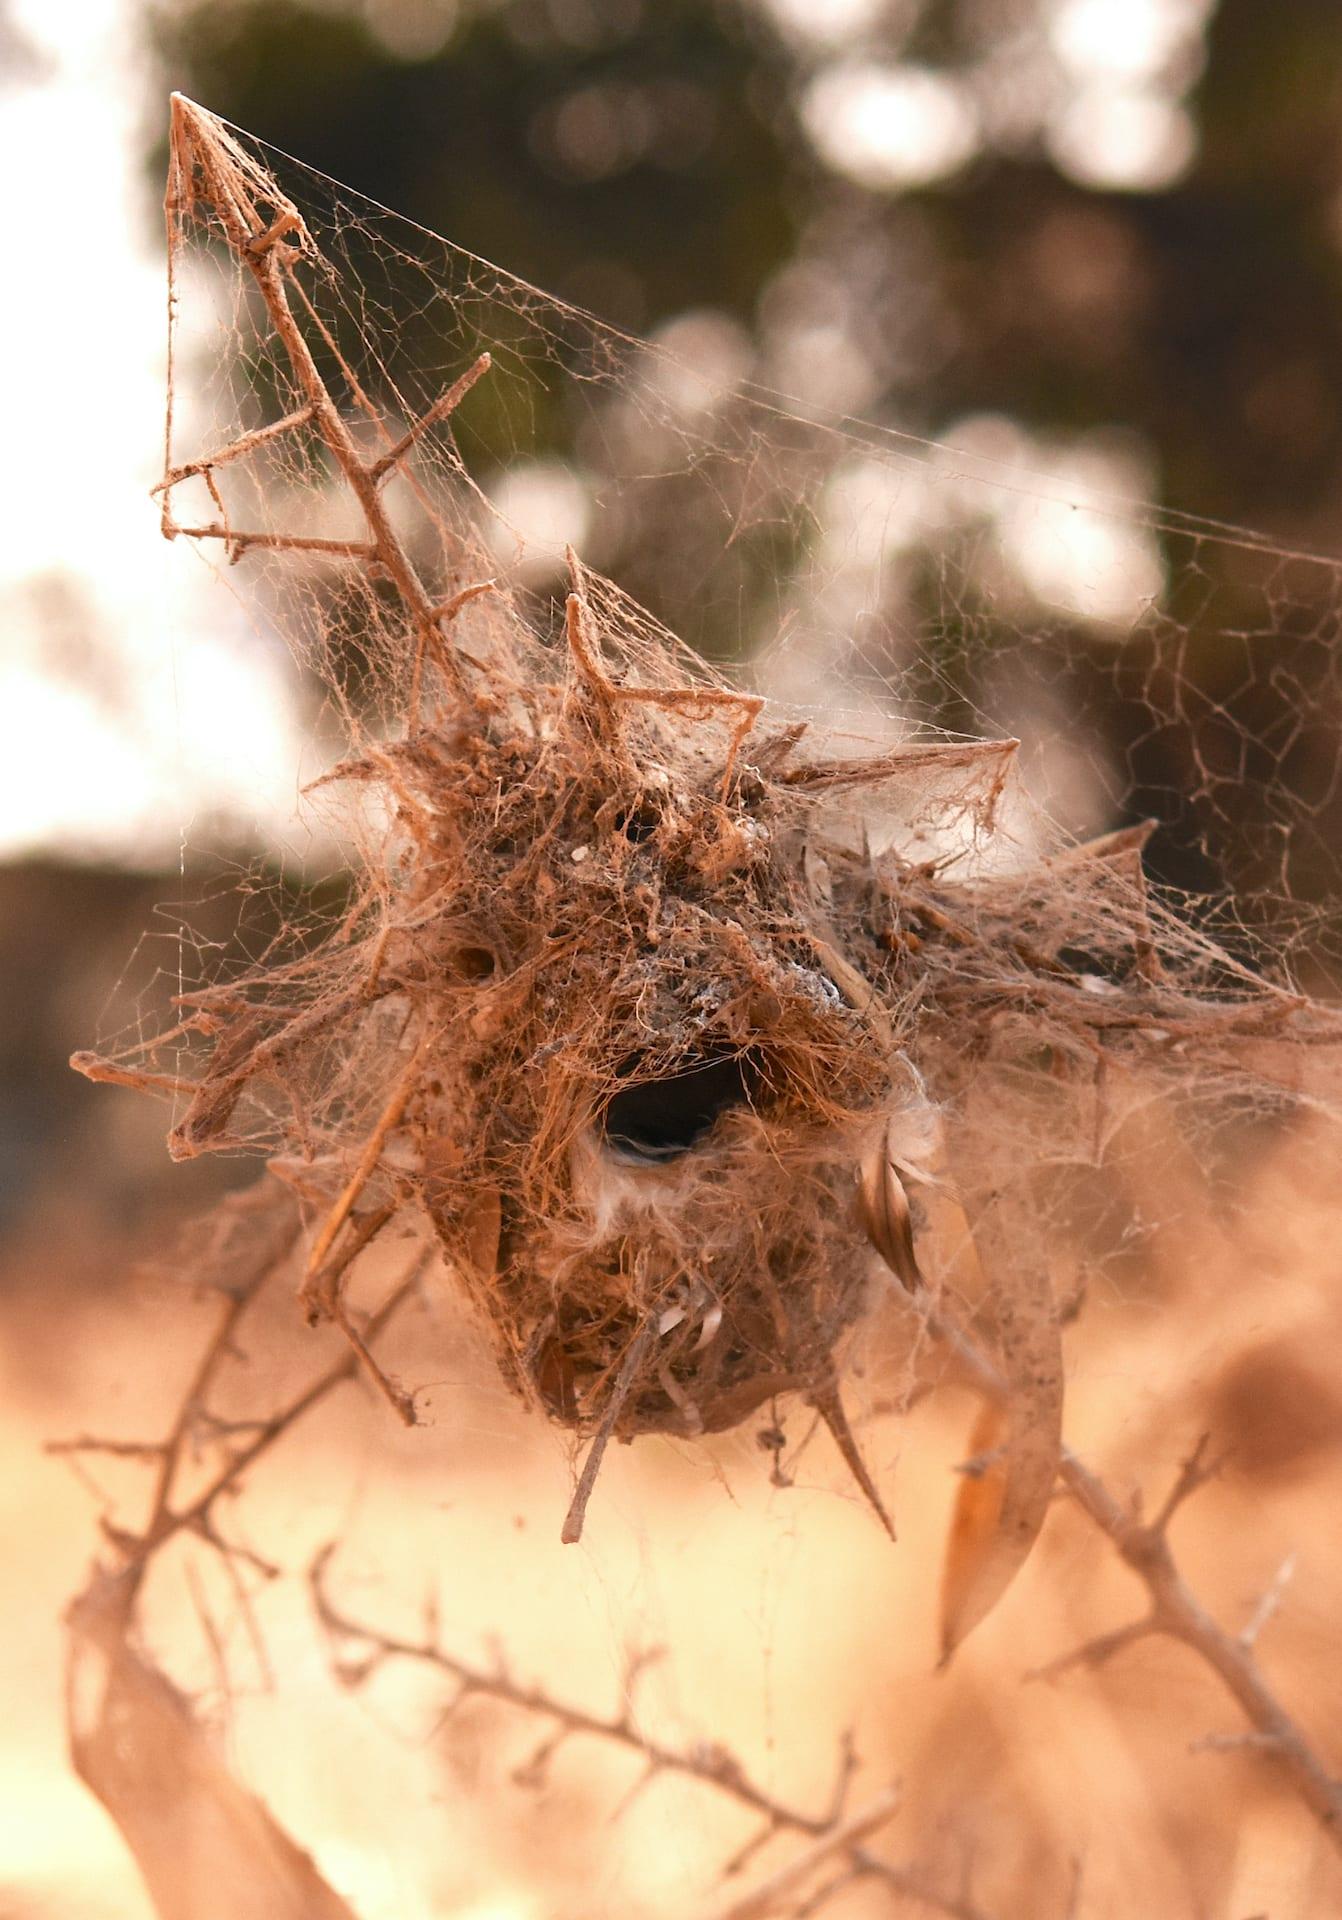 Sunbird nest inside colony of social spiders